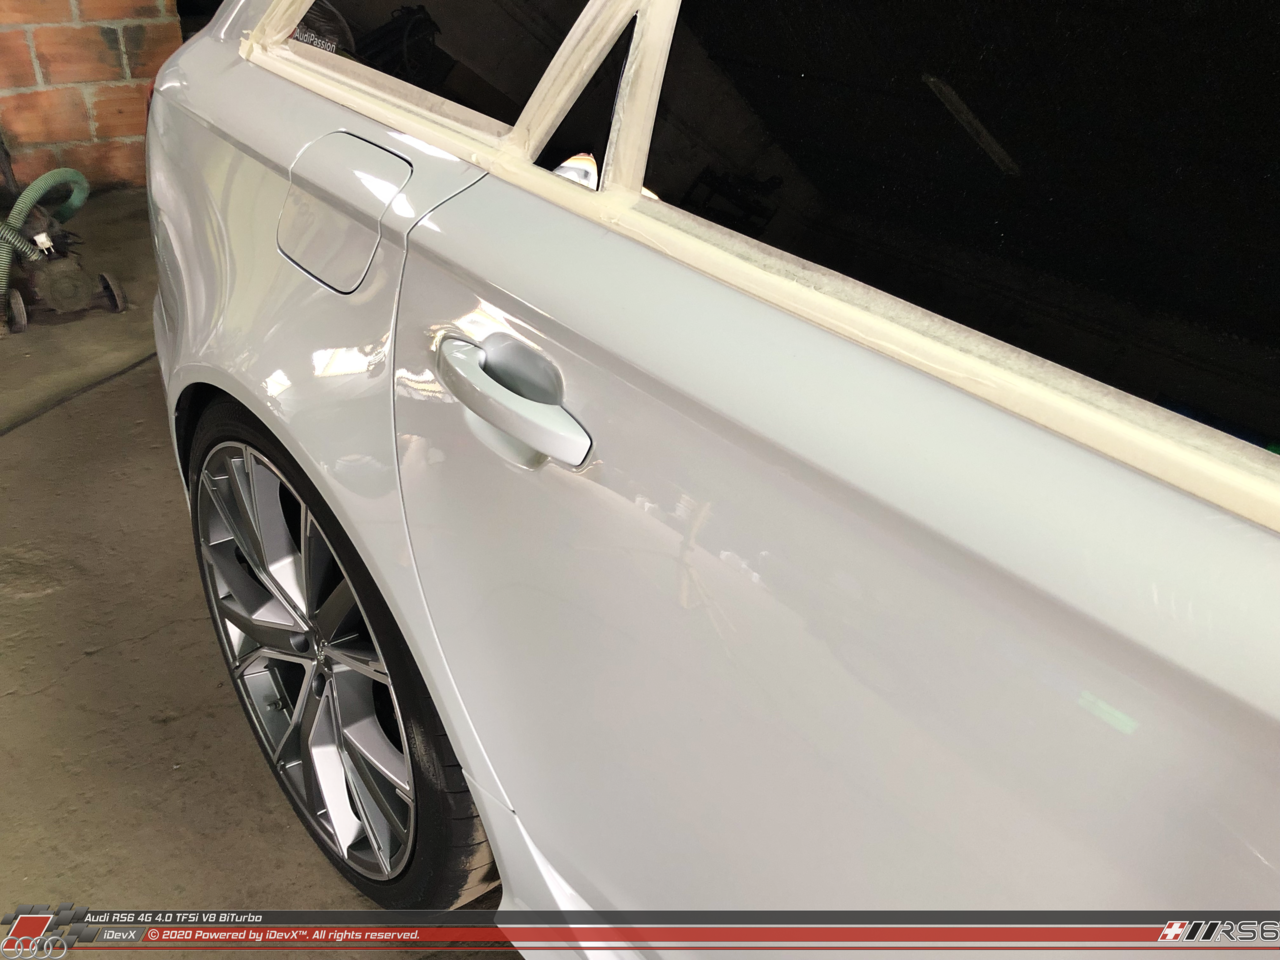 05_08.2019_Audi-RS6_iDevX_030.png